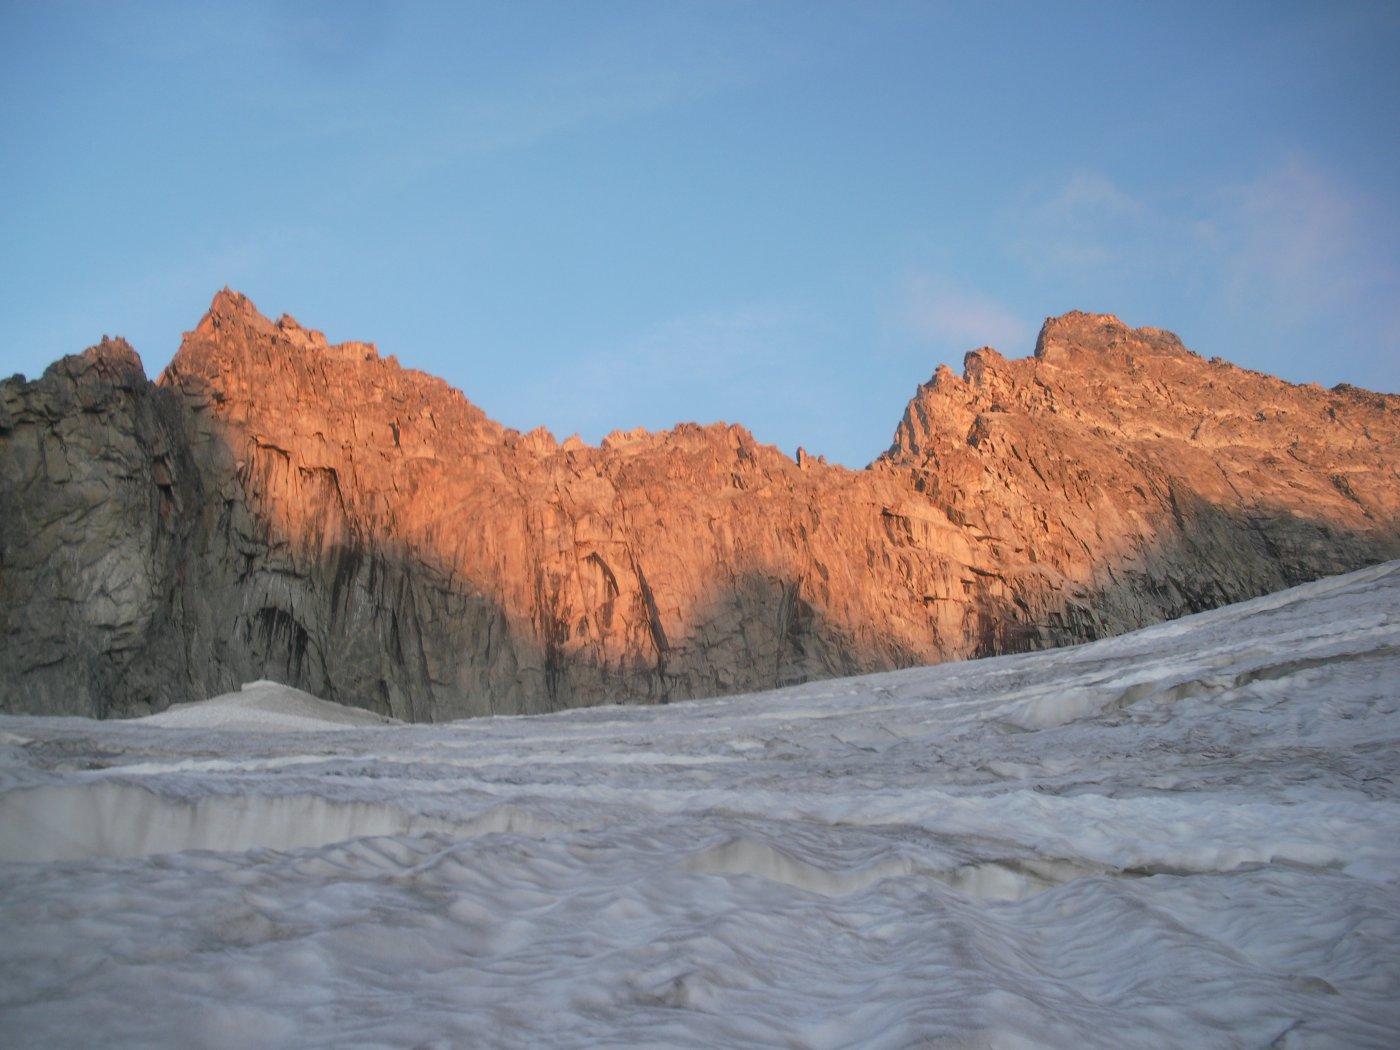 Savoie (Aiguille de) Cresta Preuss 2015-08-12